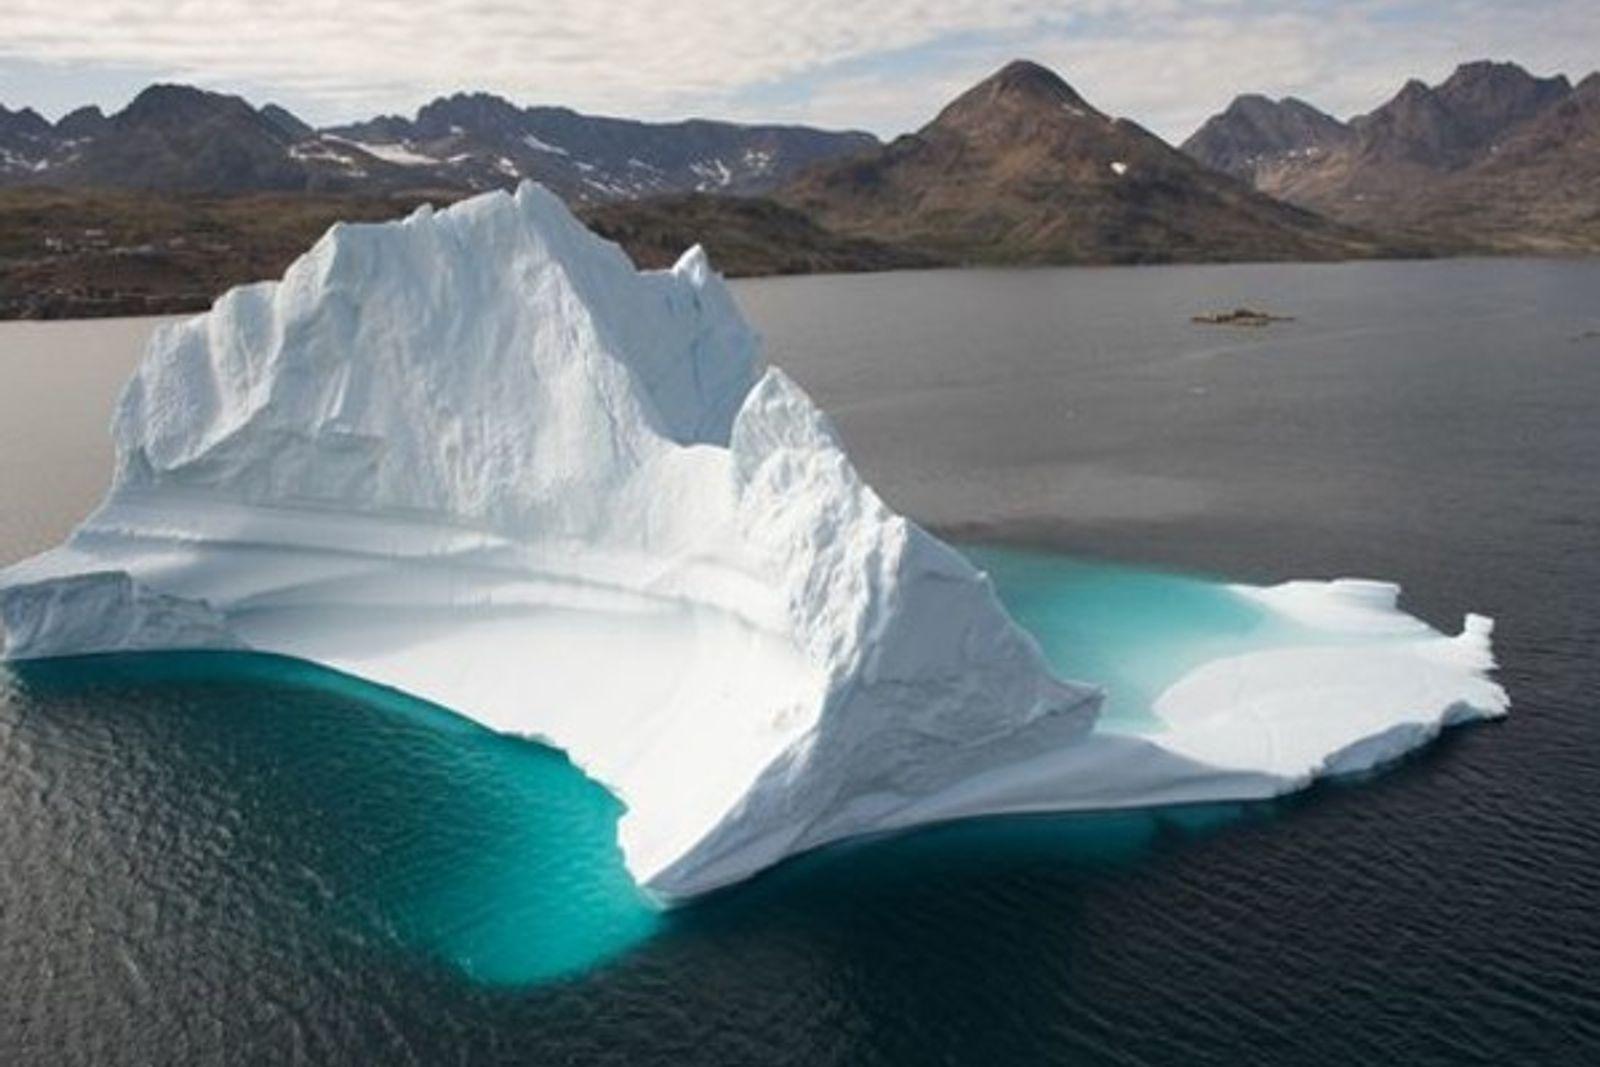 El Titanic se enfrentaría hoy a más icebergs